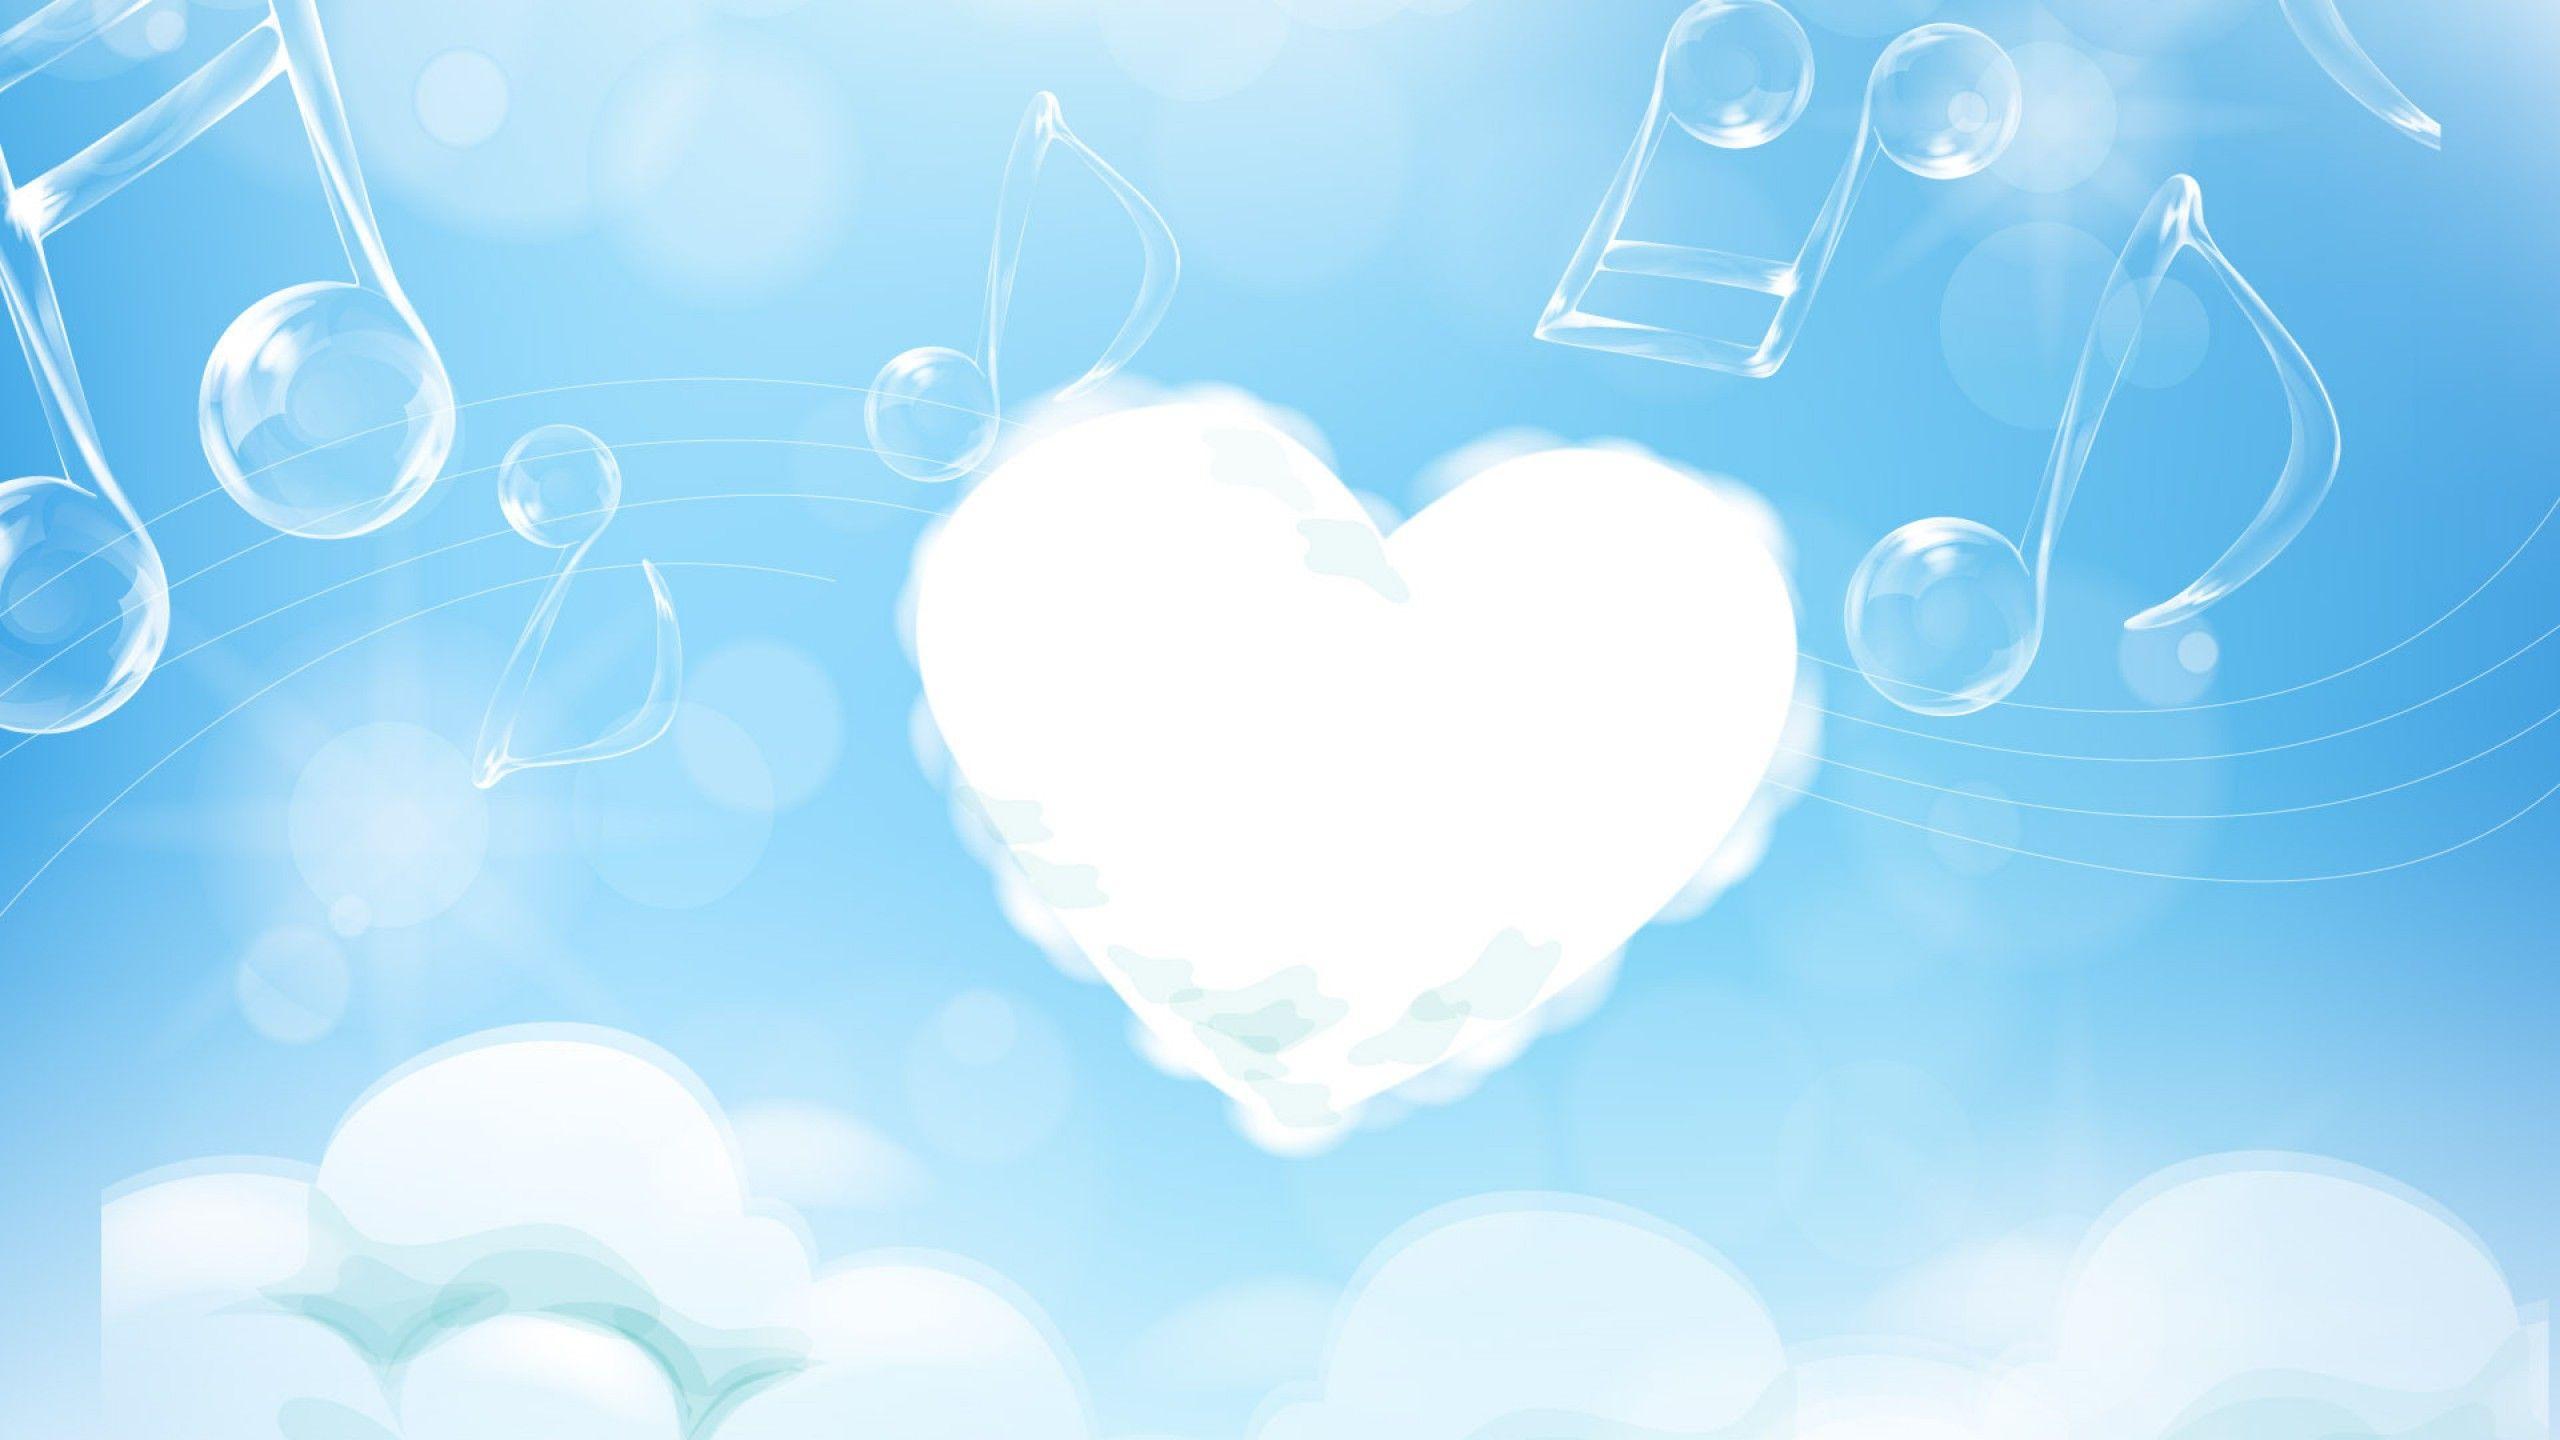 heart,-sheet-of-music,-clouds,-bubbles-205720?no-logo